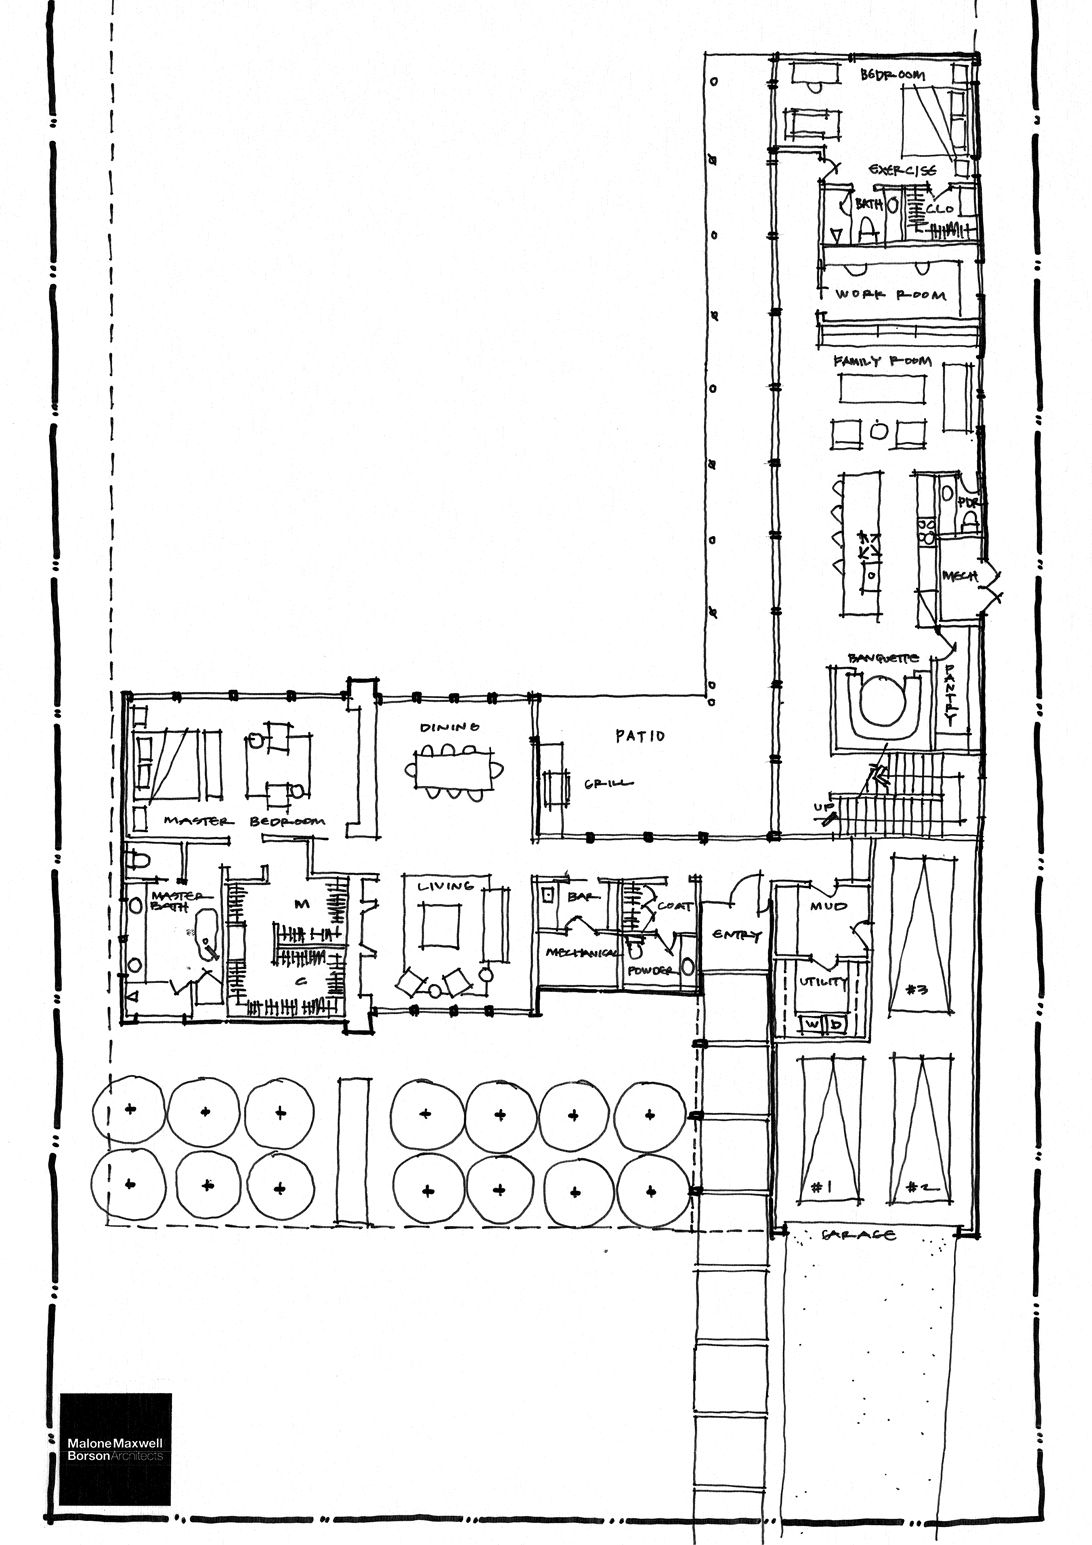 Bob Borson - Schematic Design Ground Floor Plan final | Floor Plans ...